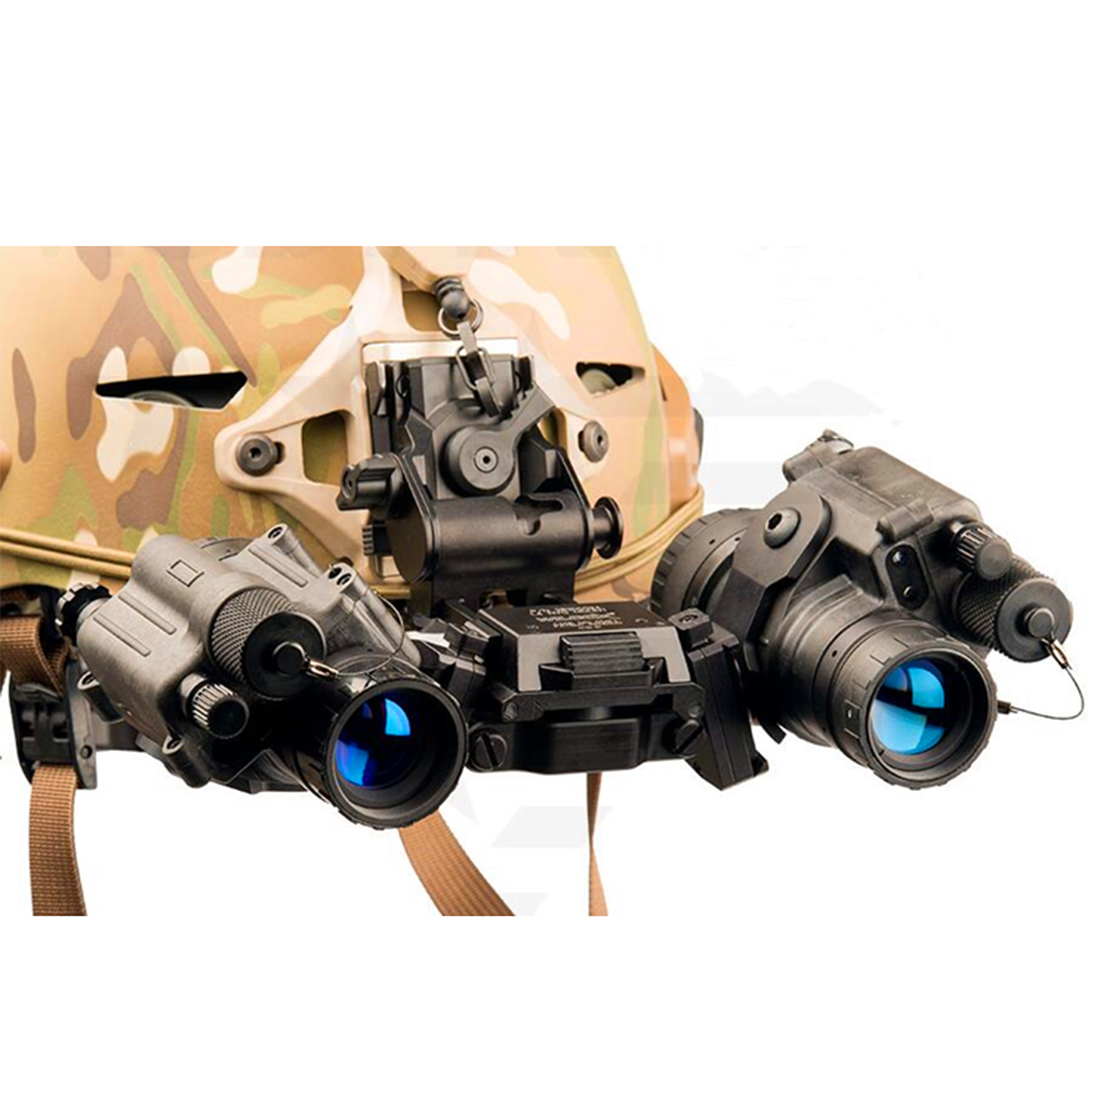 AN/PVS-14 Dual Bracket Holder for Binocular Night-vision (Full Set of Shell, Not Included Image Intensifier Tube)